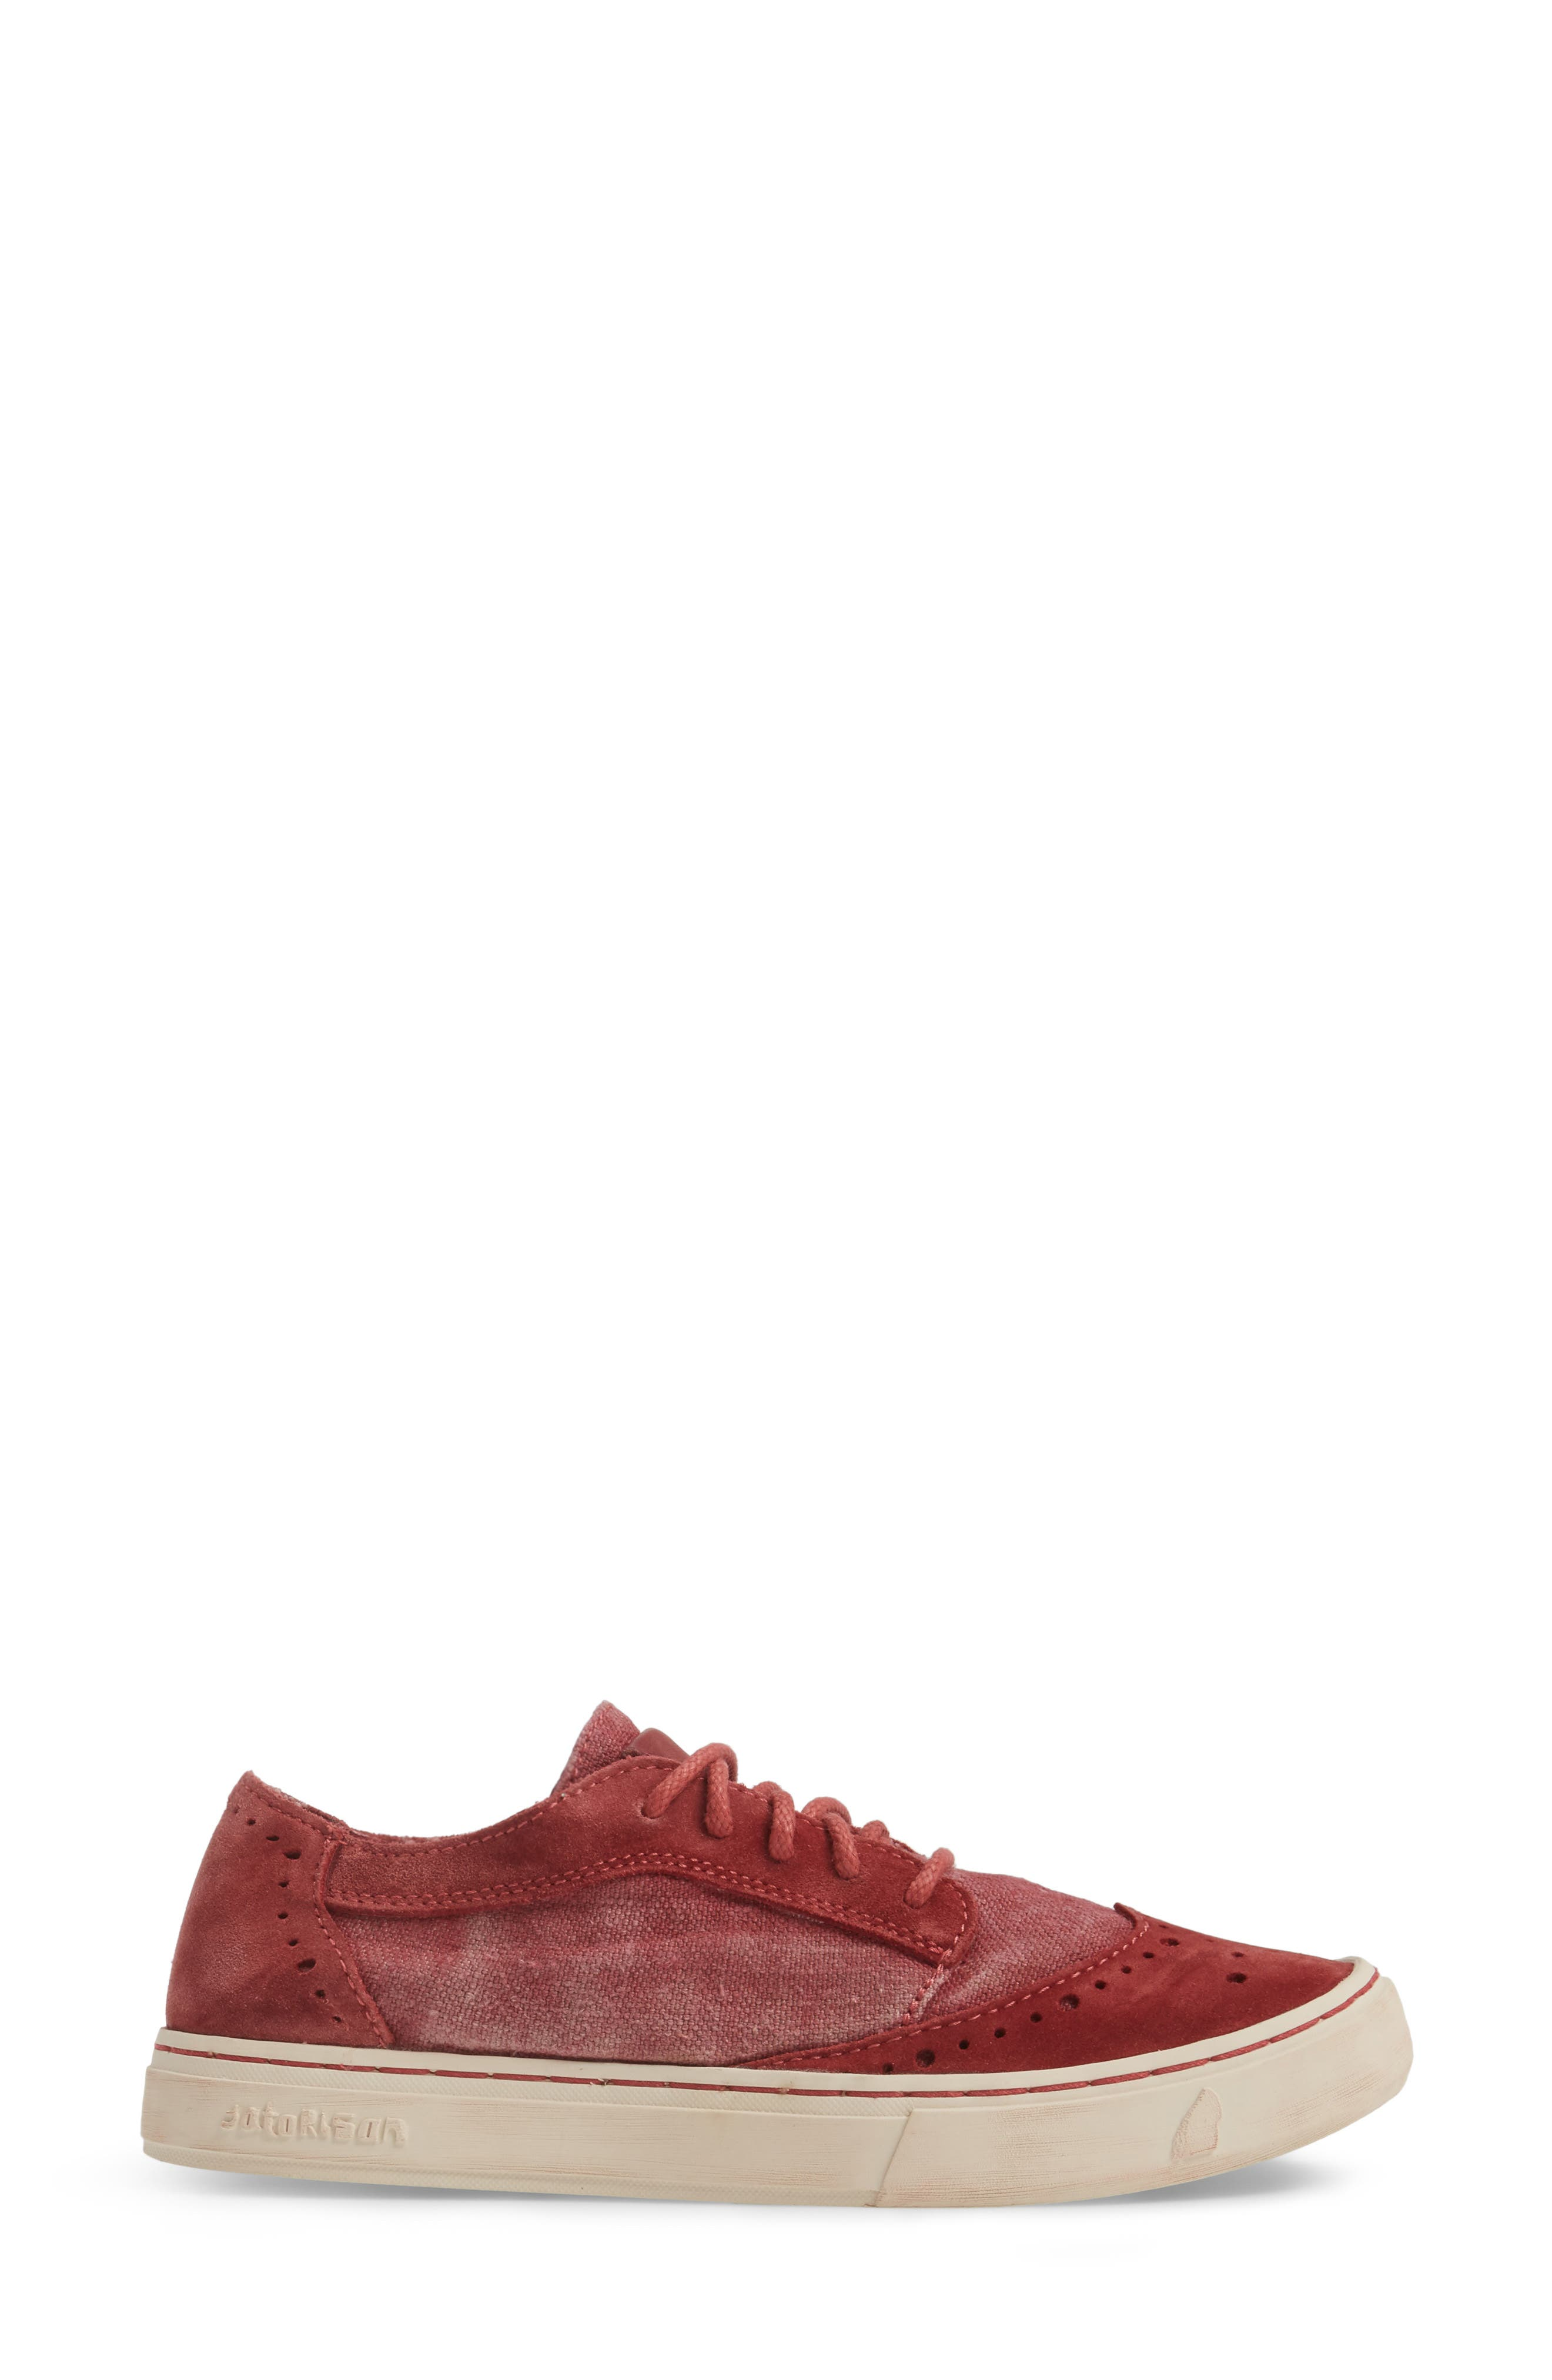 Yukai Sneaker,                             Alternate thumbnail 3, color,                             SANDALWOOD